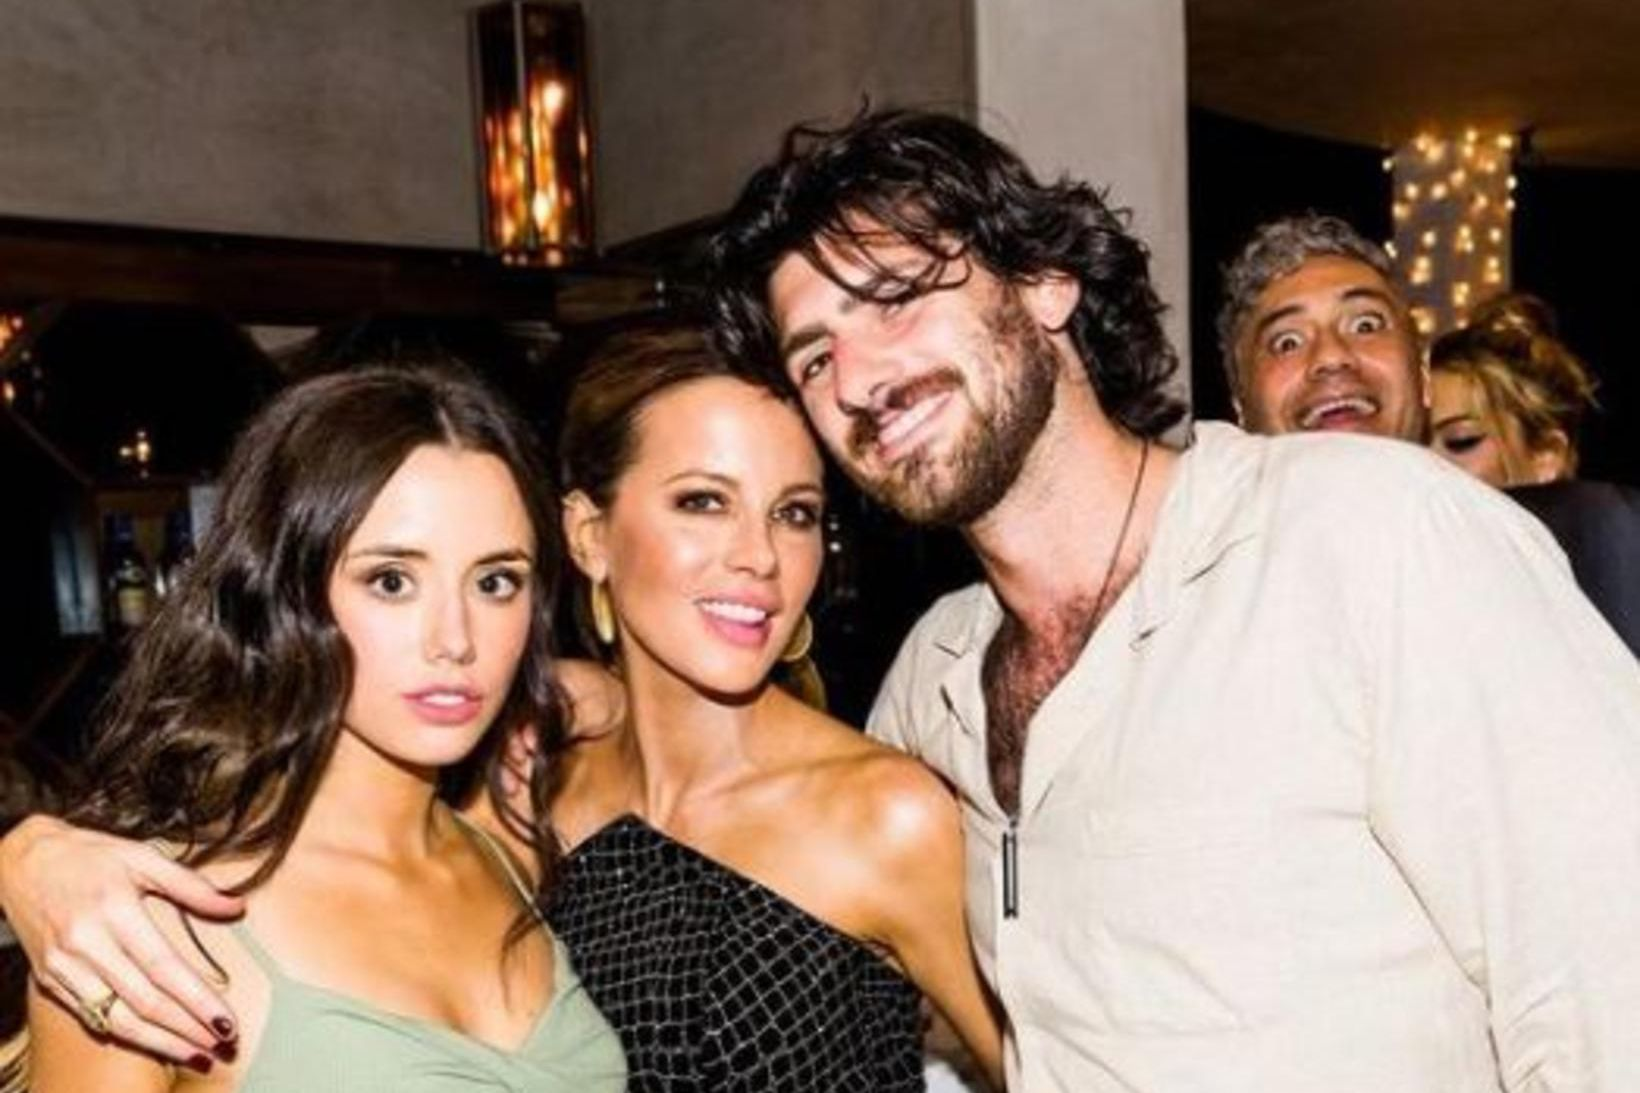 Lily Sheen, Kate Beckinsale og kærasti Sheen, David Schechter